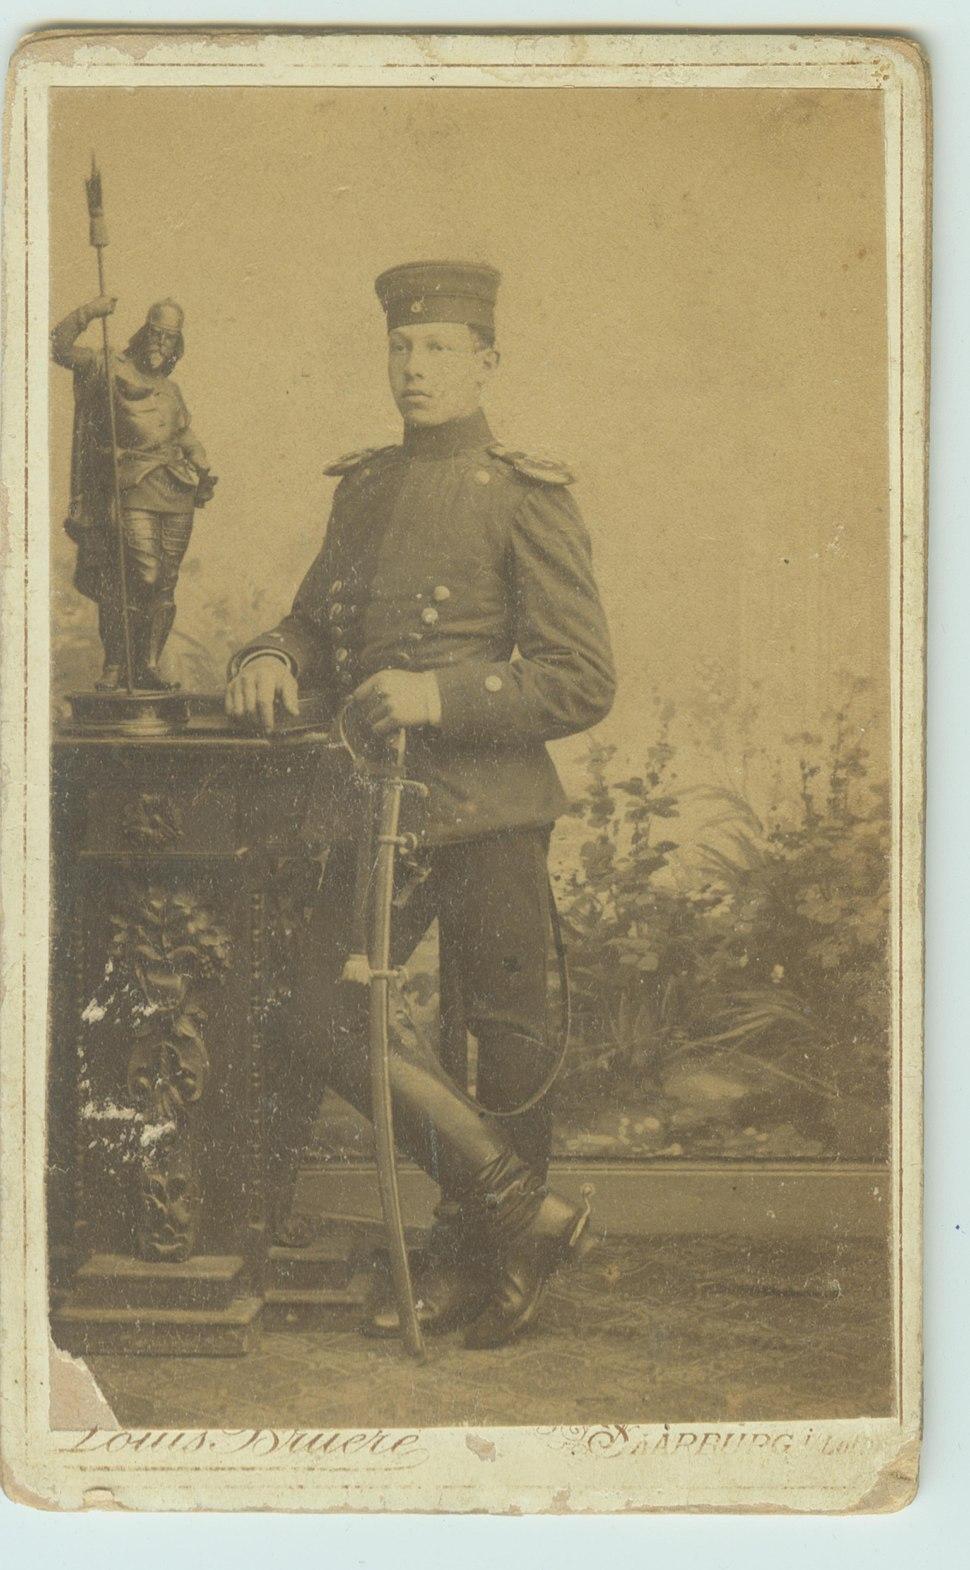 1890 gustav ermann kaiser soldier saarbrucken Germany